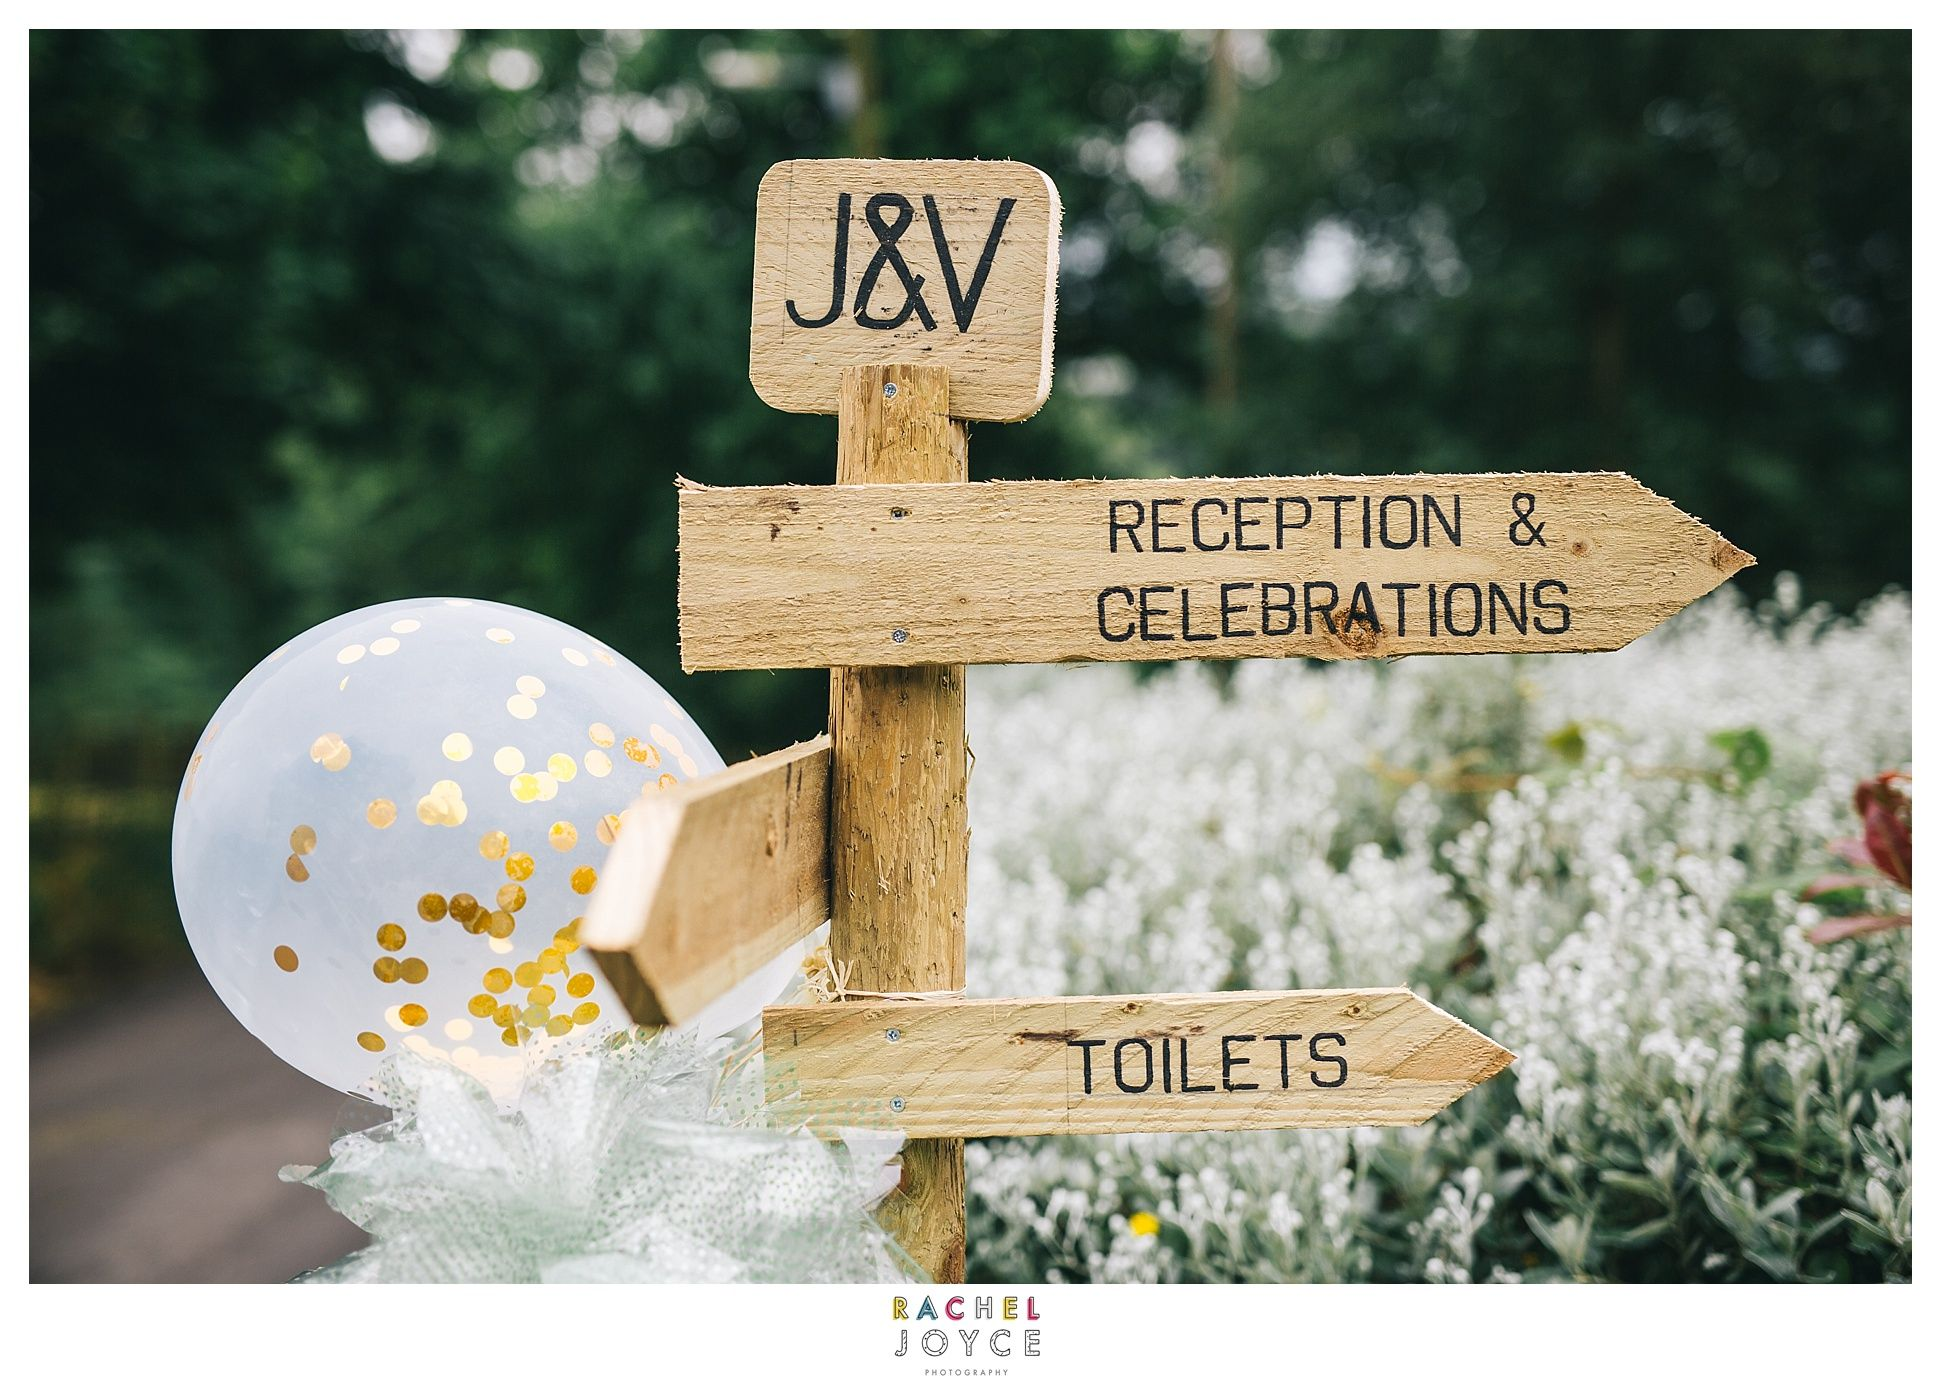 Outdoor Wedding Signs Diy Creative Photographer Vintage Themed Https